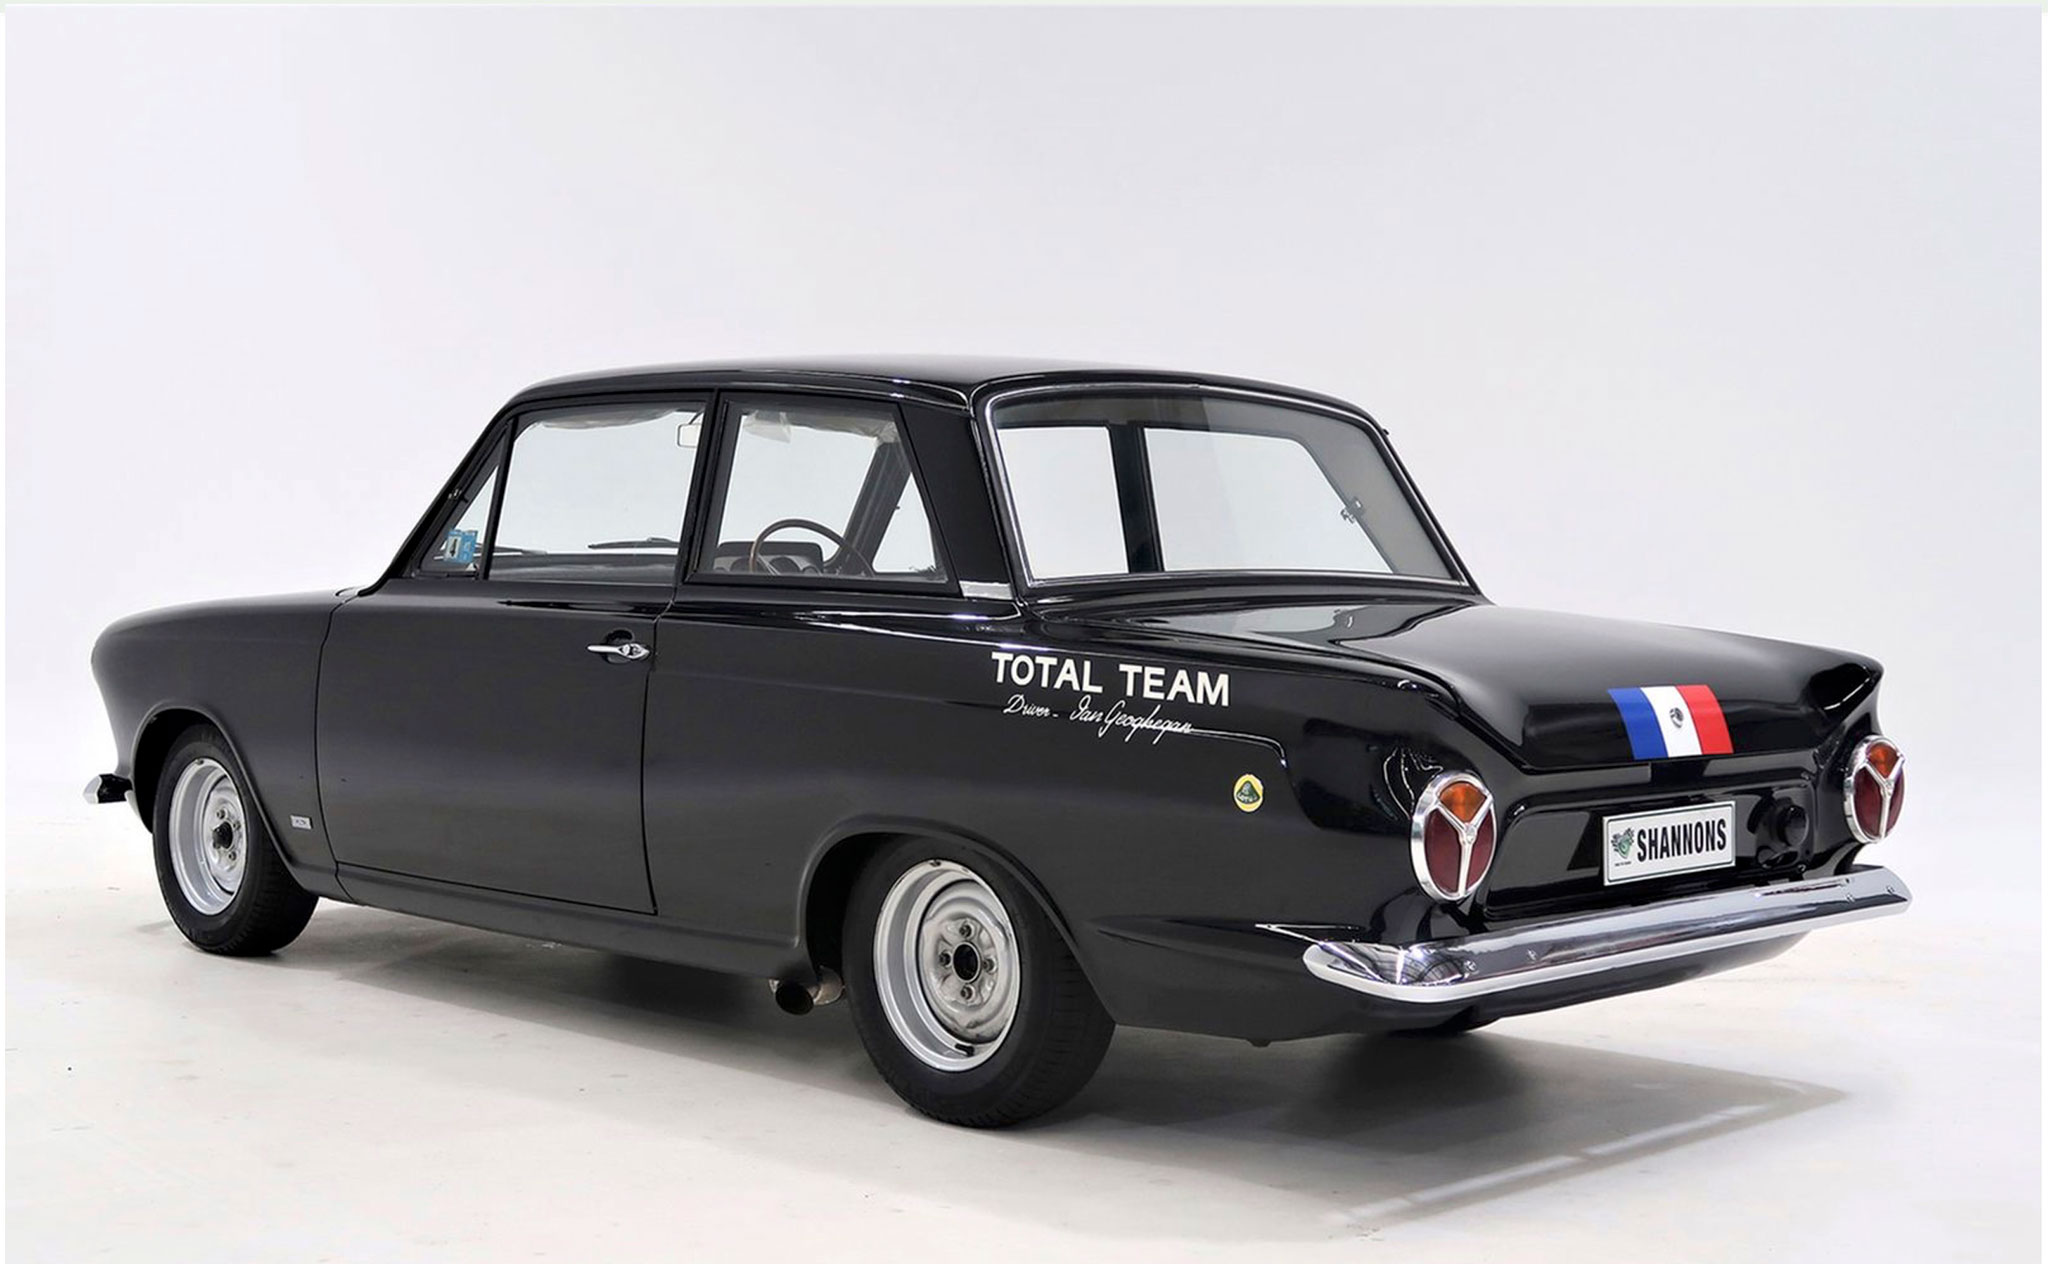 1964 Lotus Cortina Mk 1 AUD$200,000-$250,000 - Sportives Ford aux enchères.